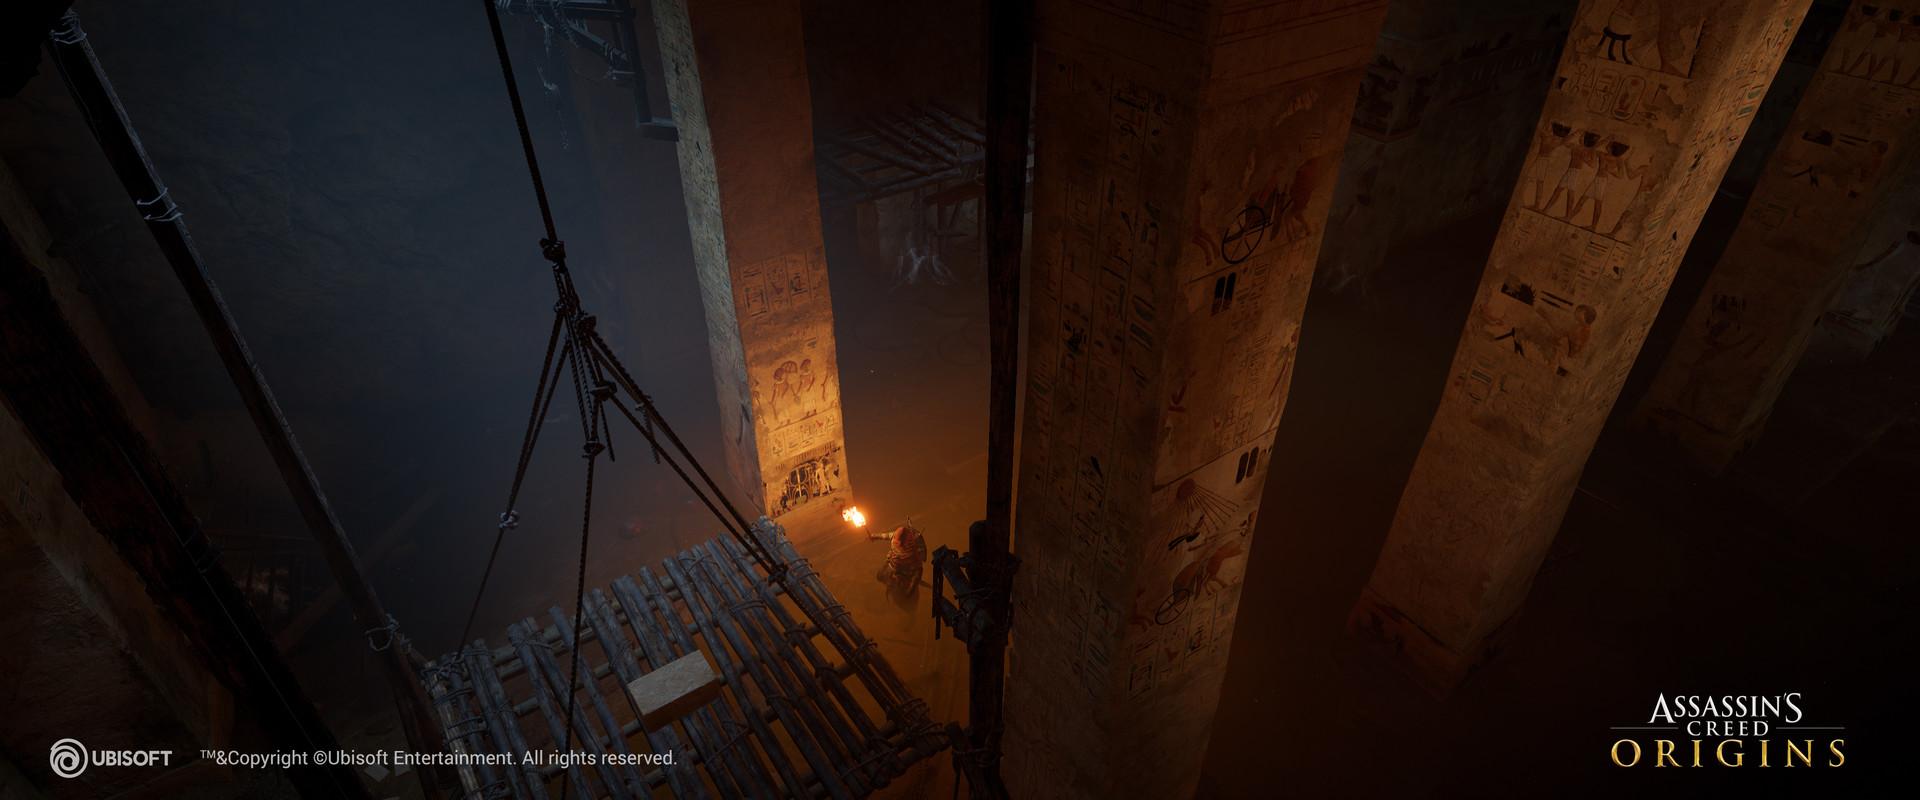 Ivet jordanova aco tmb 2 & Ivet Jordanova - Assassinu0027s Creed Origins - Tombs lighting